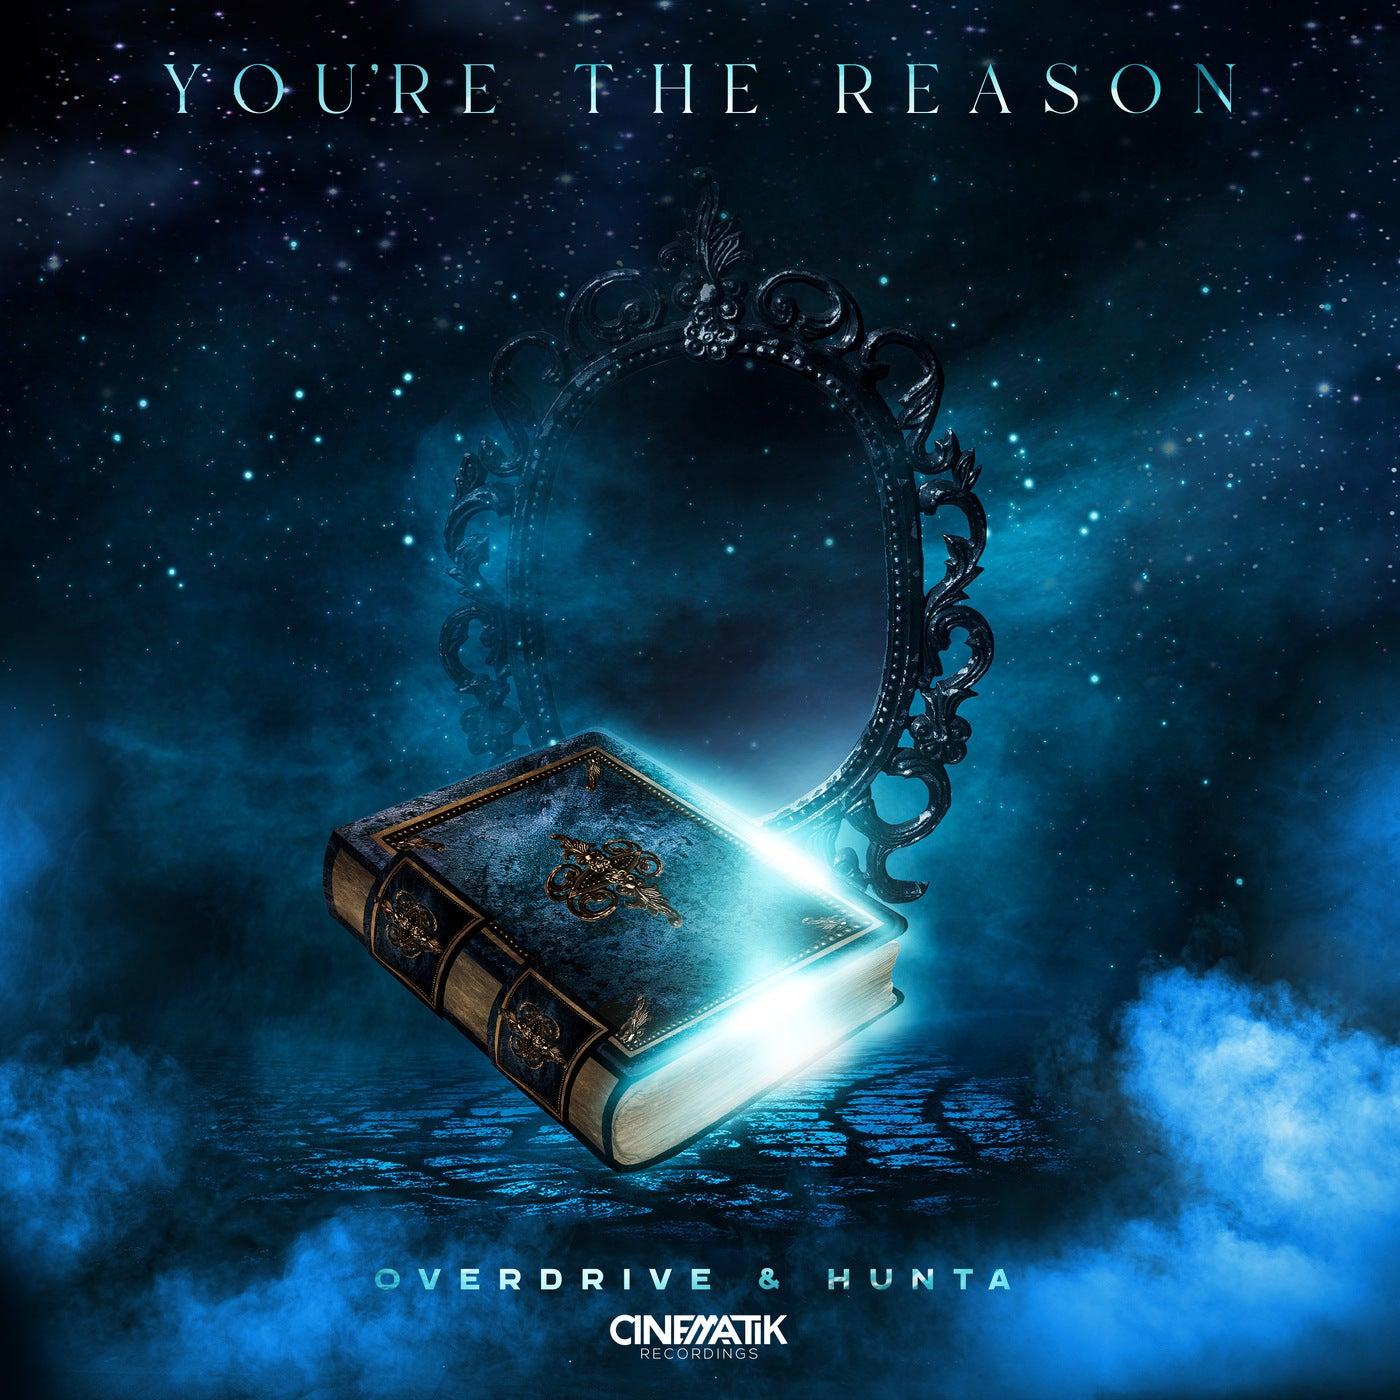 You're the Reason (Original Mix)